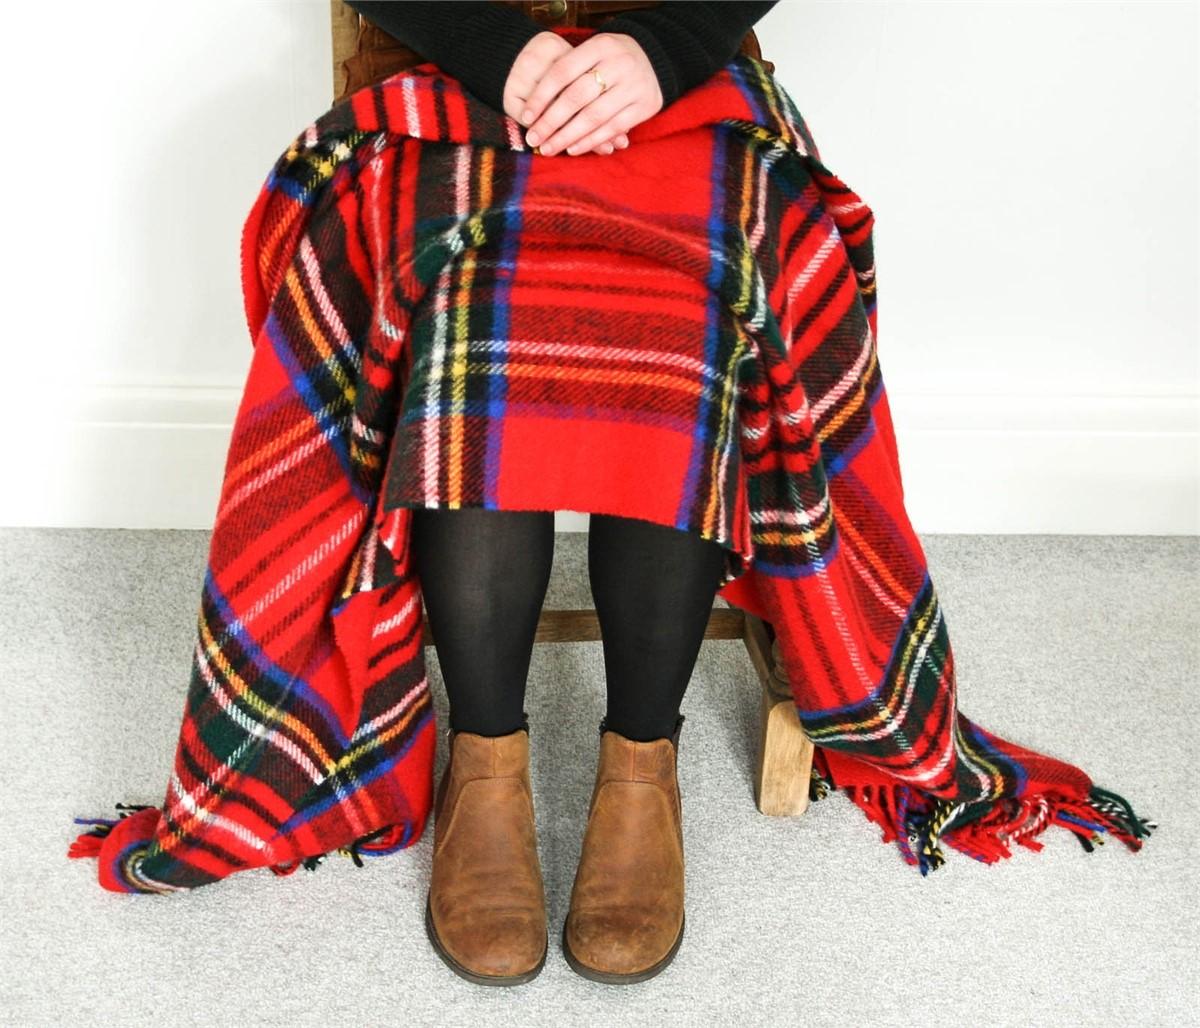 Wool Blanket Online. British Made Gifts. Red Royal Stewart